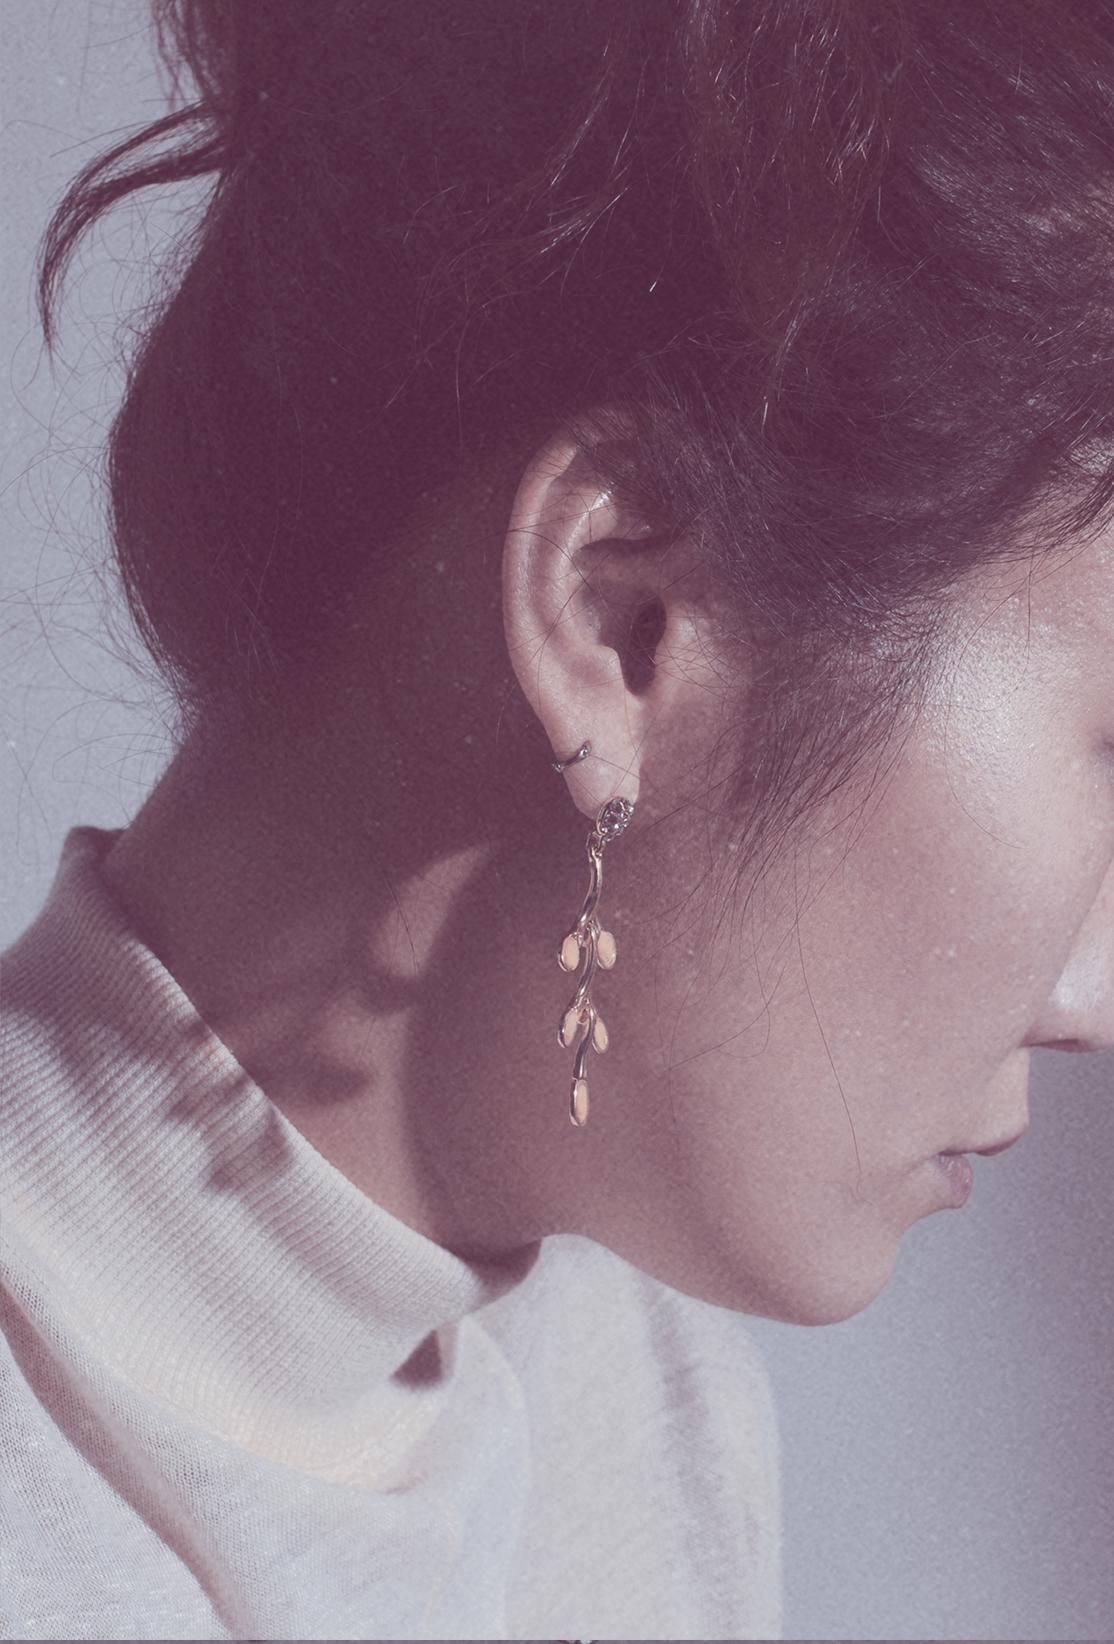 Photo6-Dress Unravelau, earrings Casa Jewelry.jpg